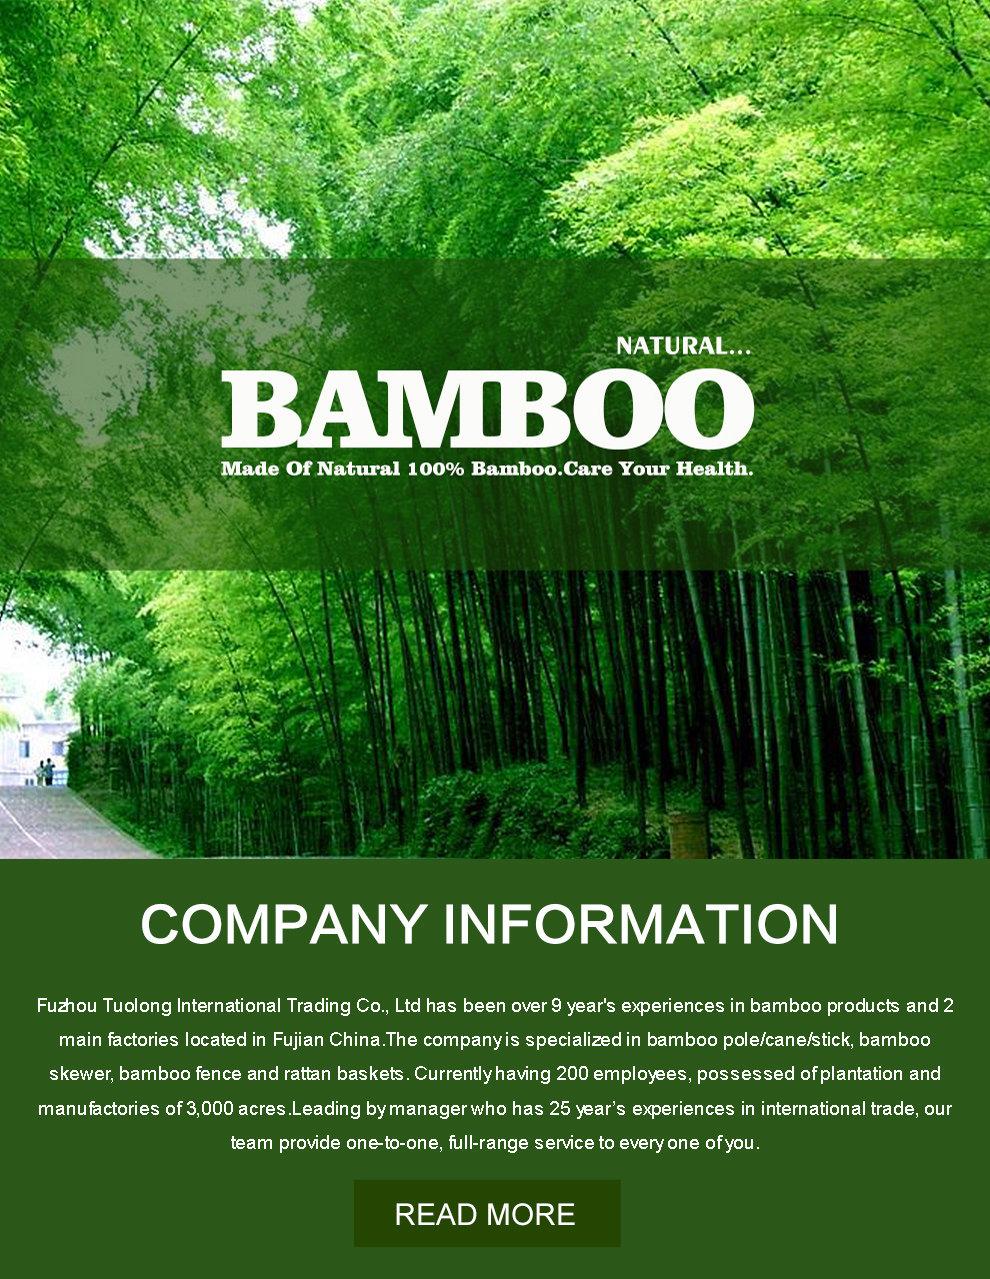 Fuzhou Tuolong International Trading Co., Ltd. - Solid Bamboo ...